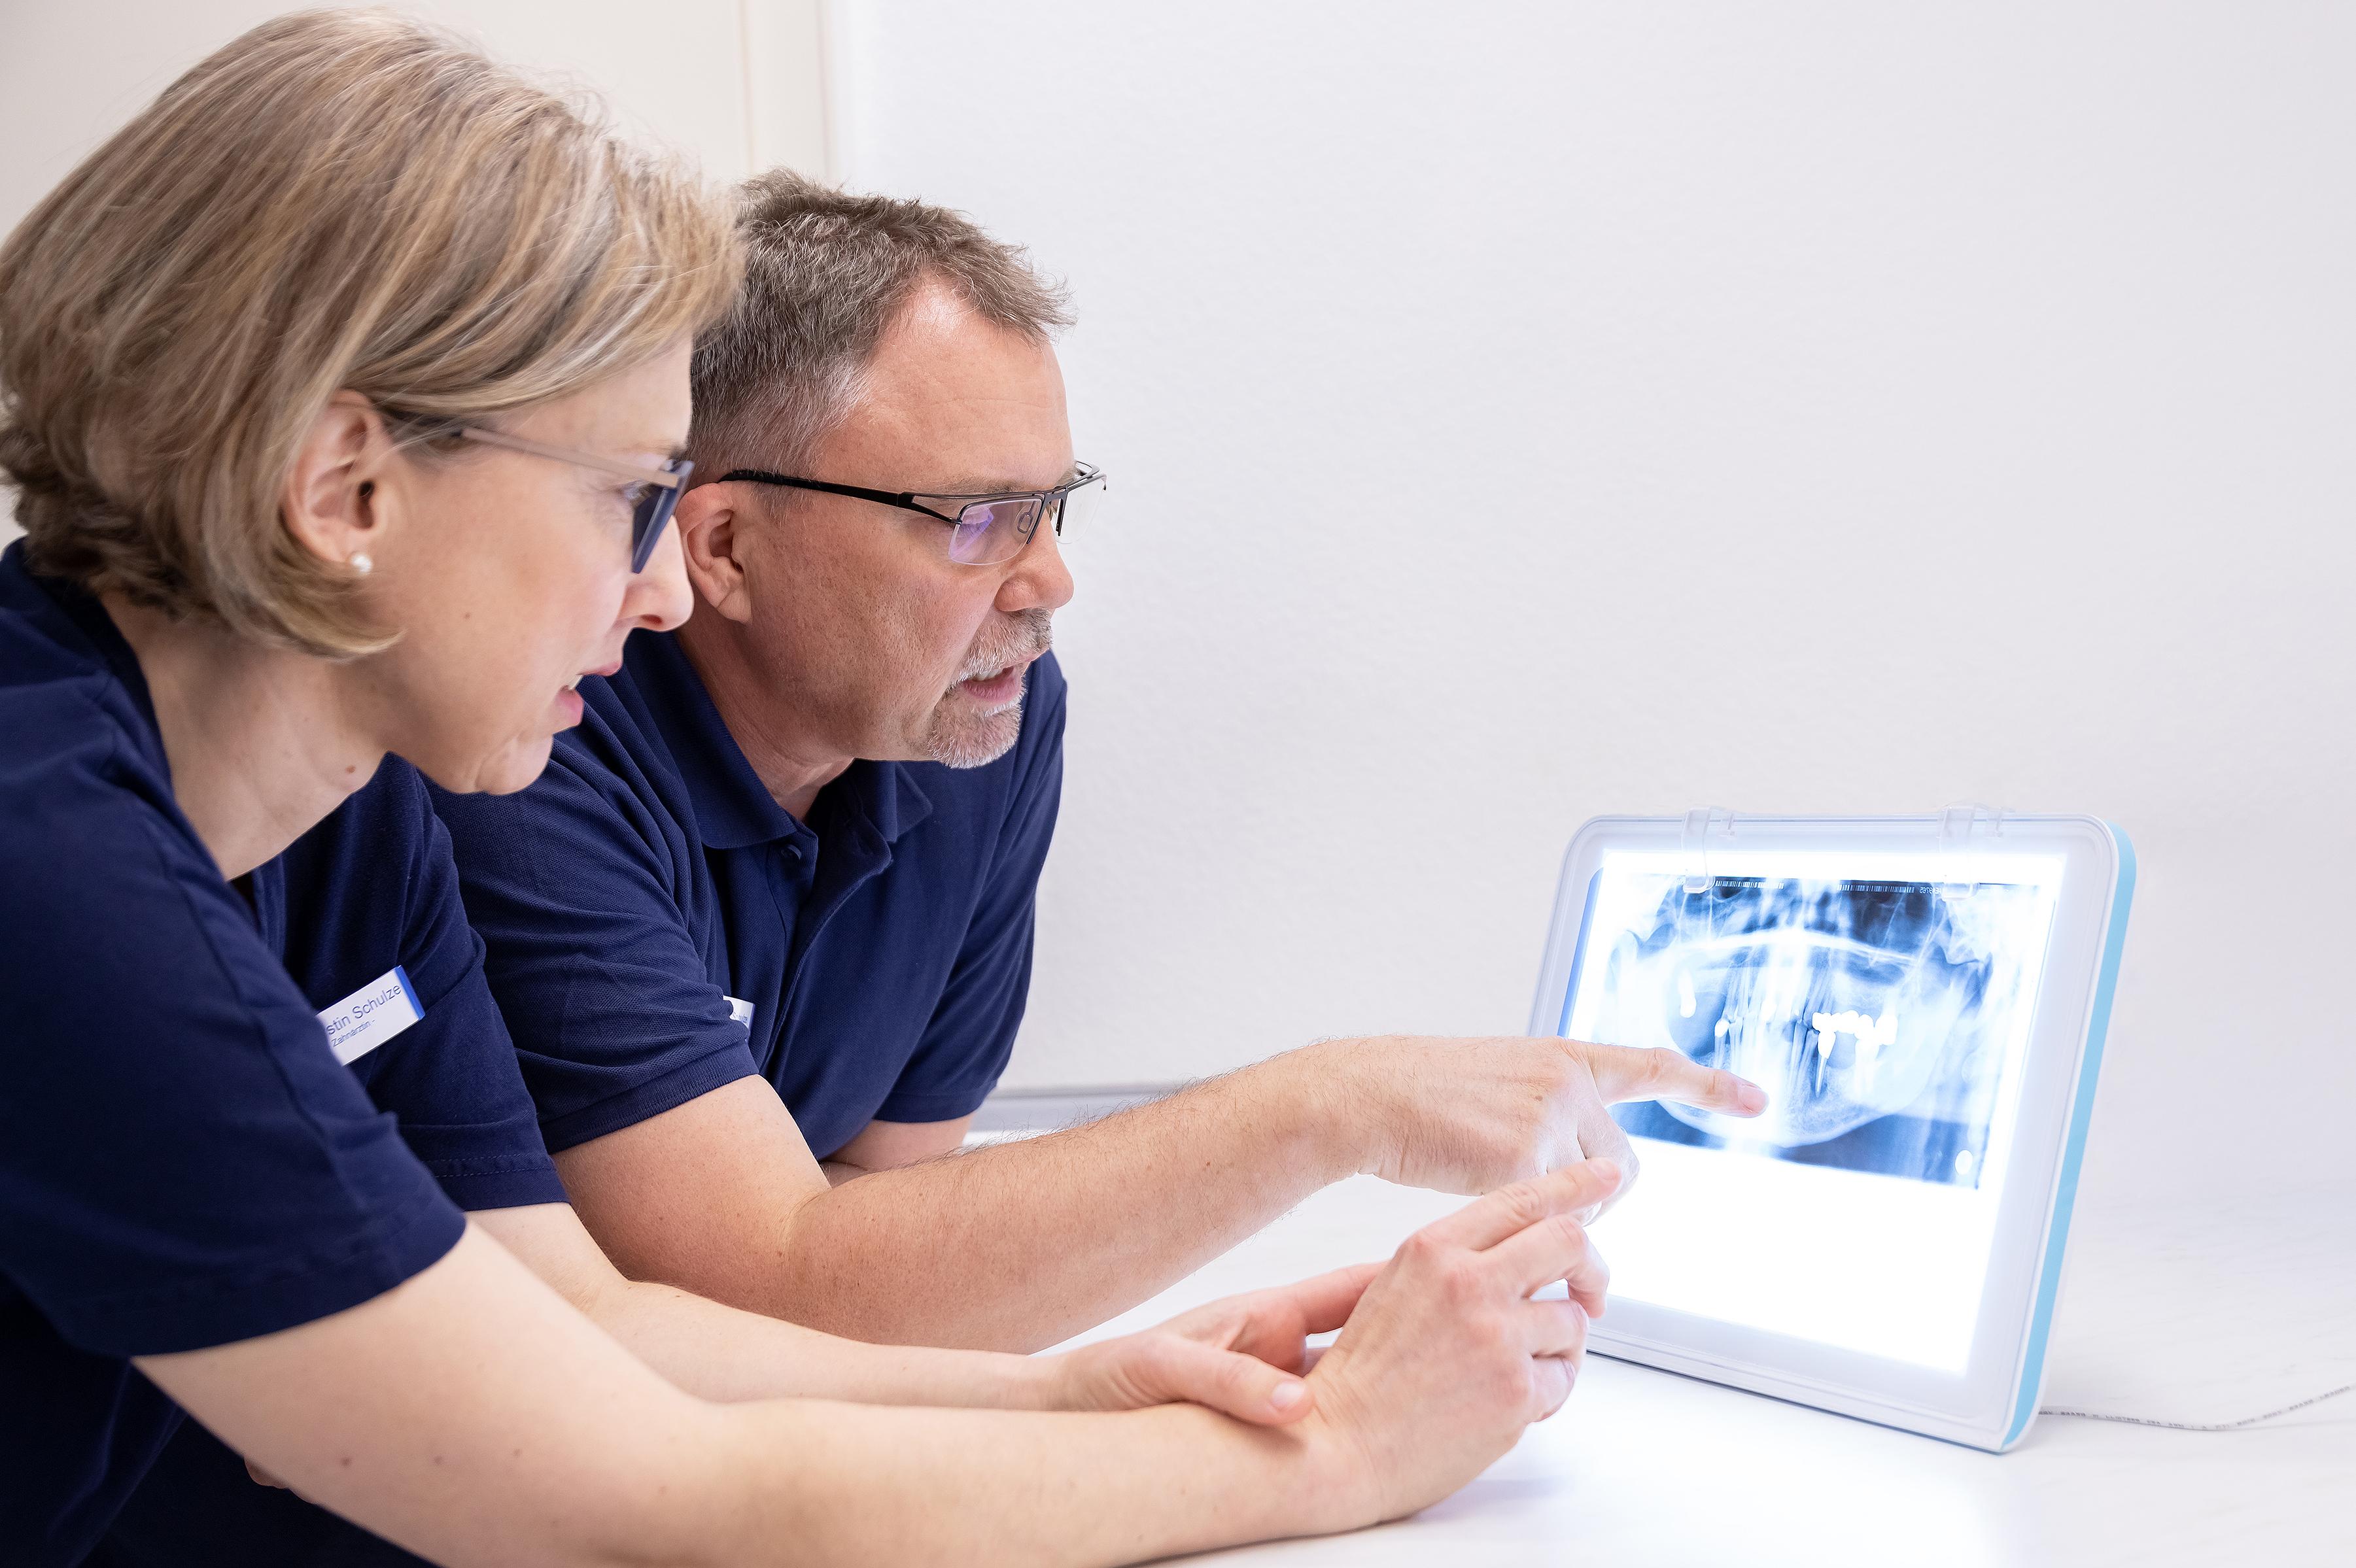 Röntgenanalyse